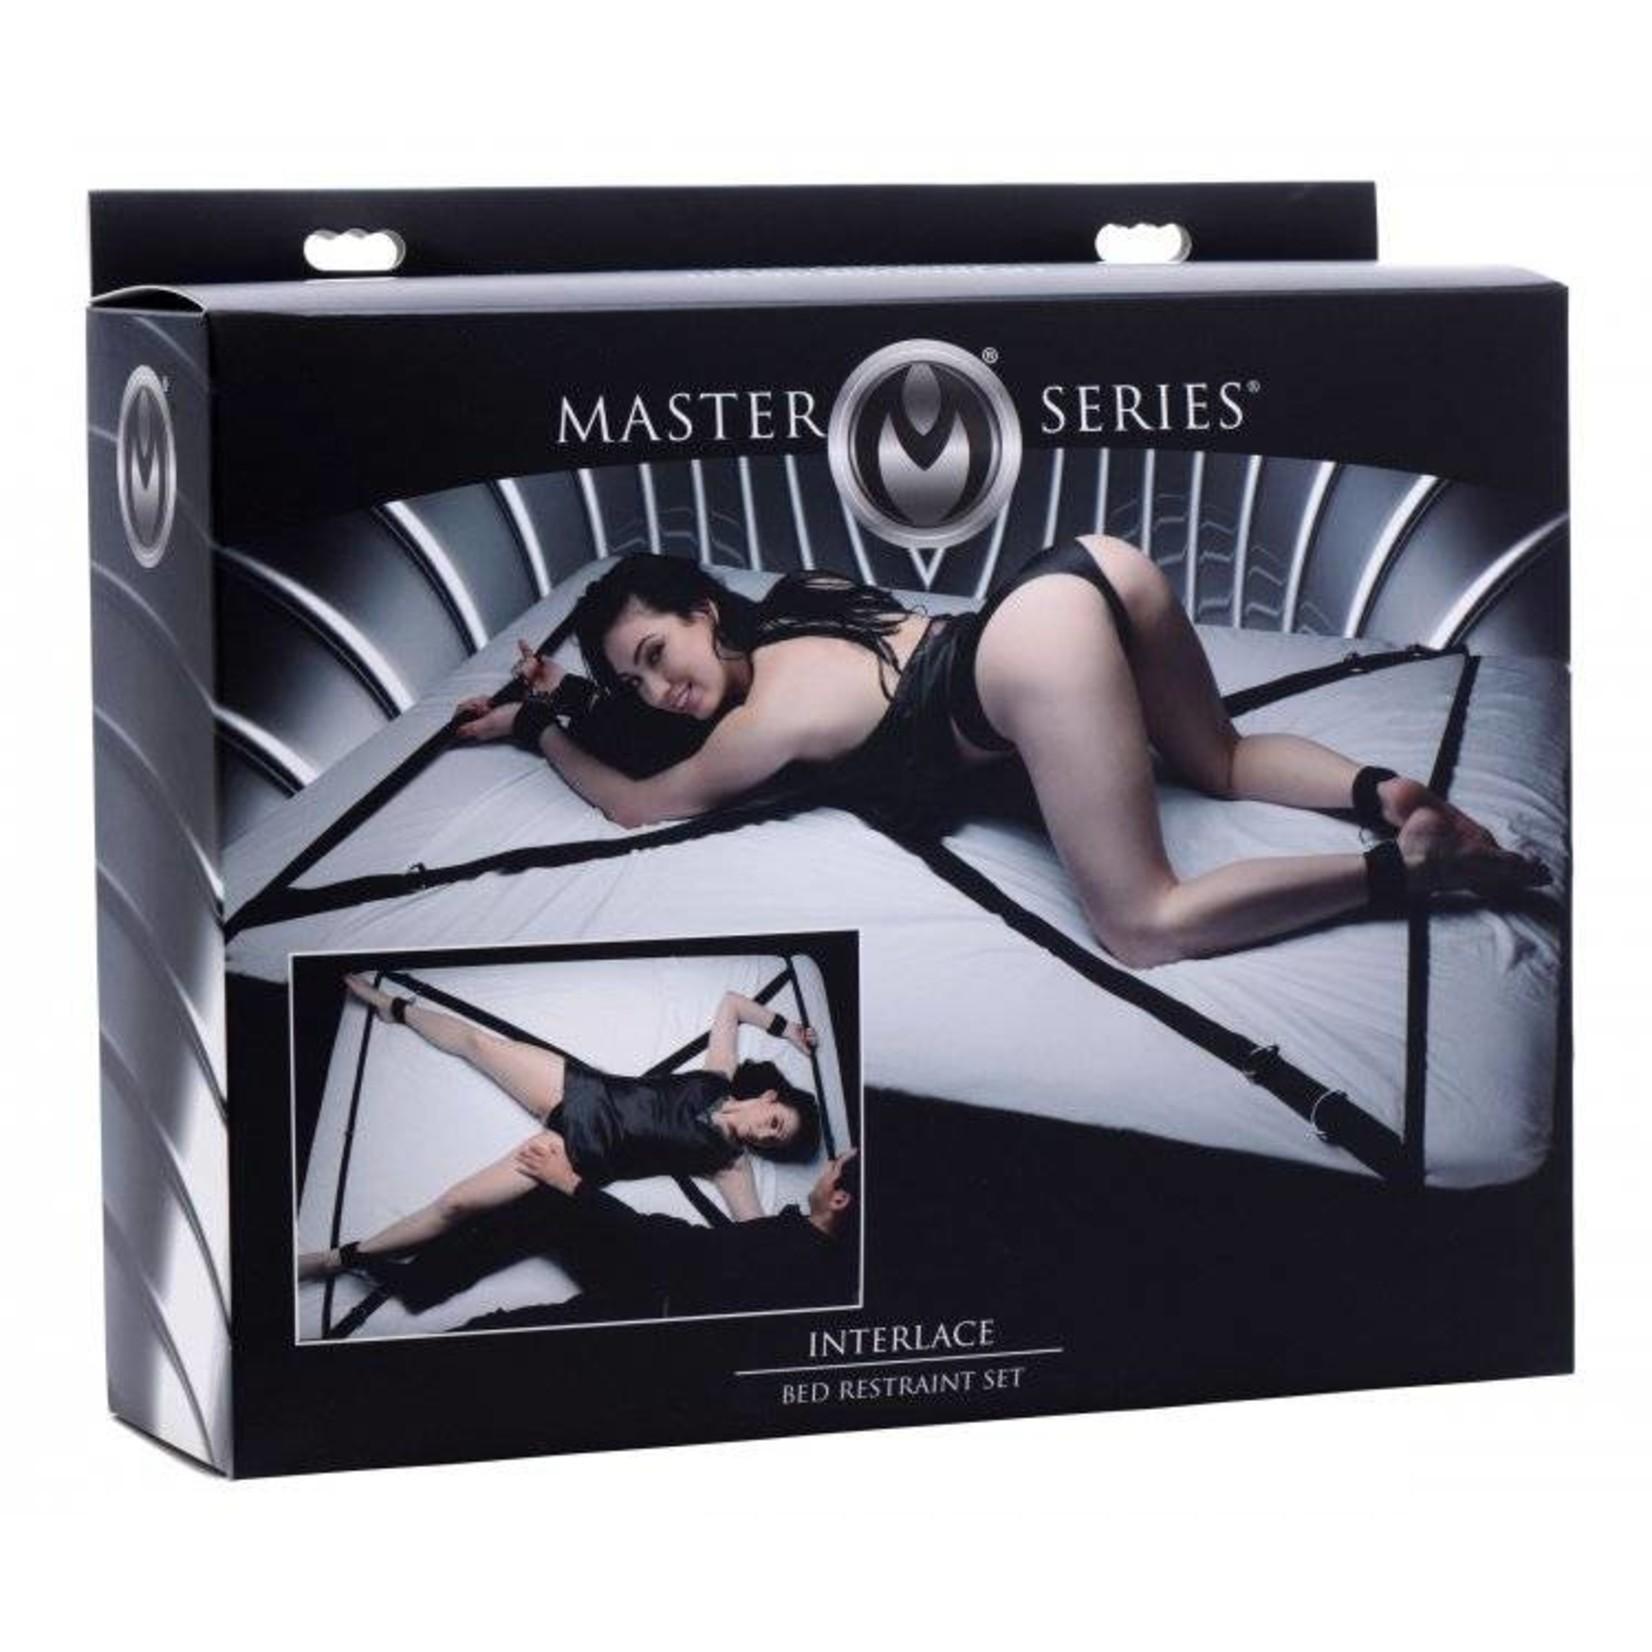 Master Series Interlace Bed Restraint Set